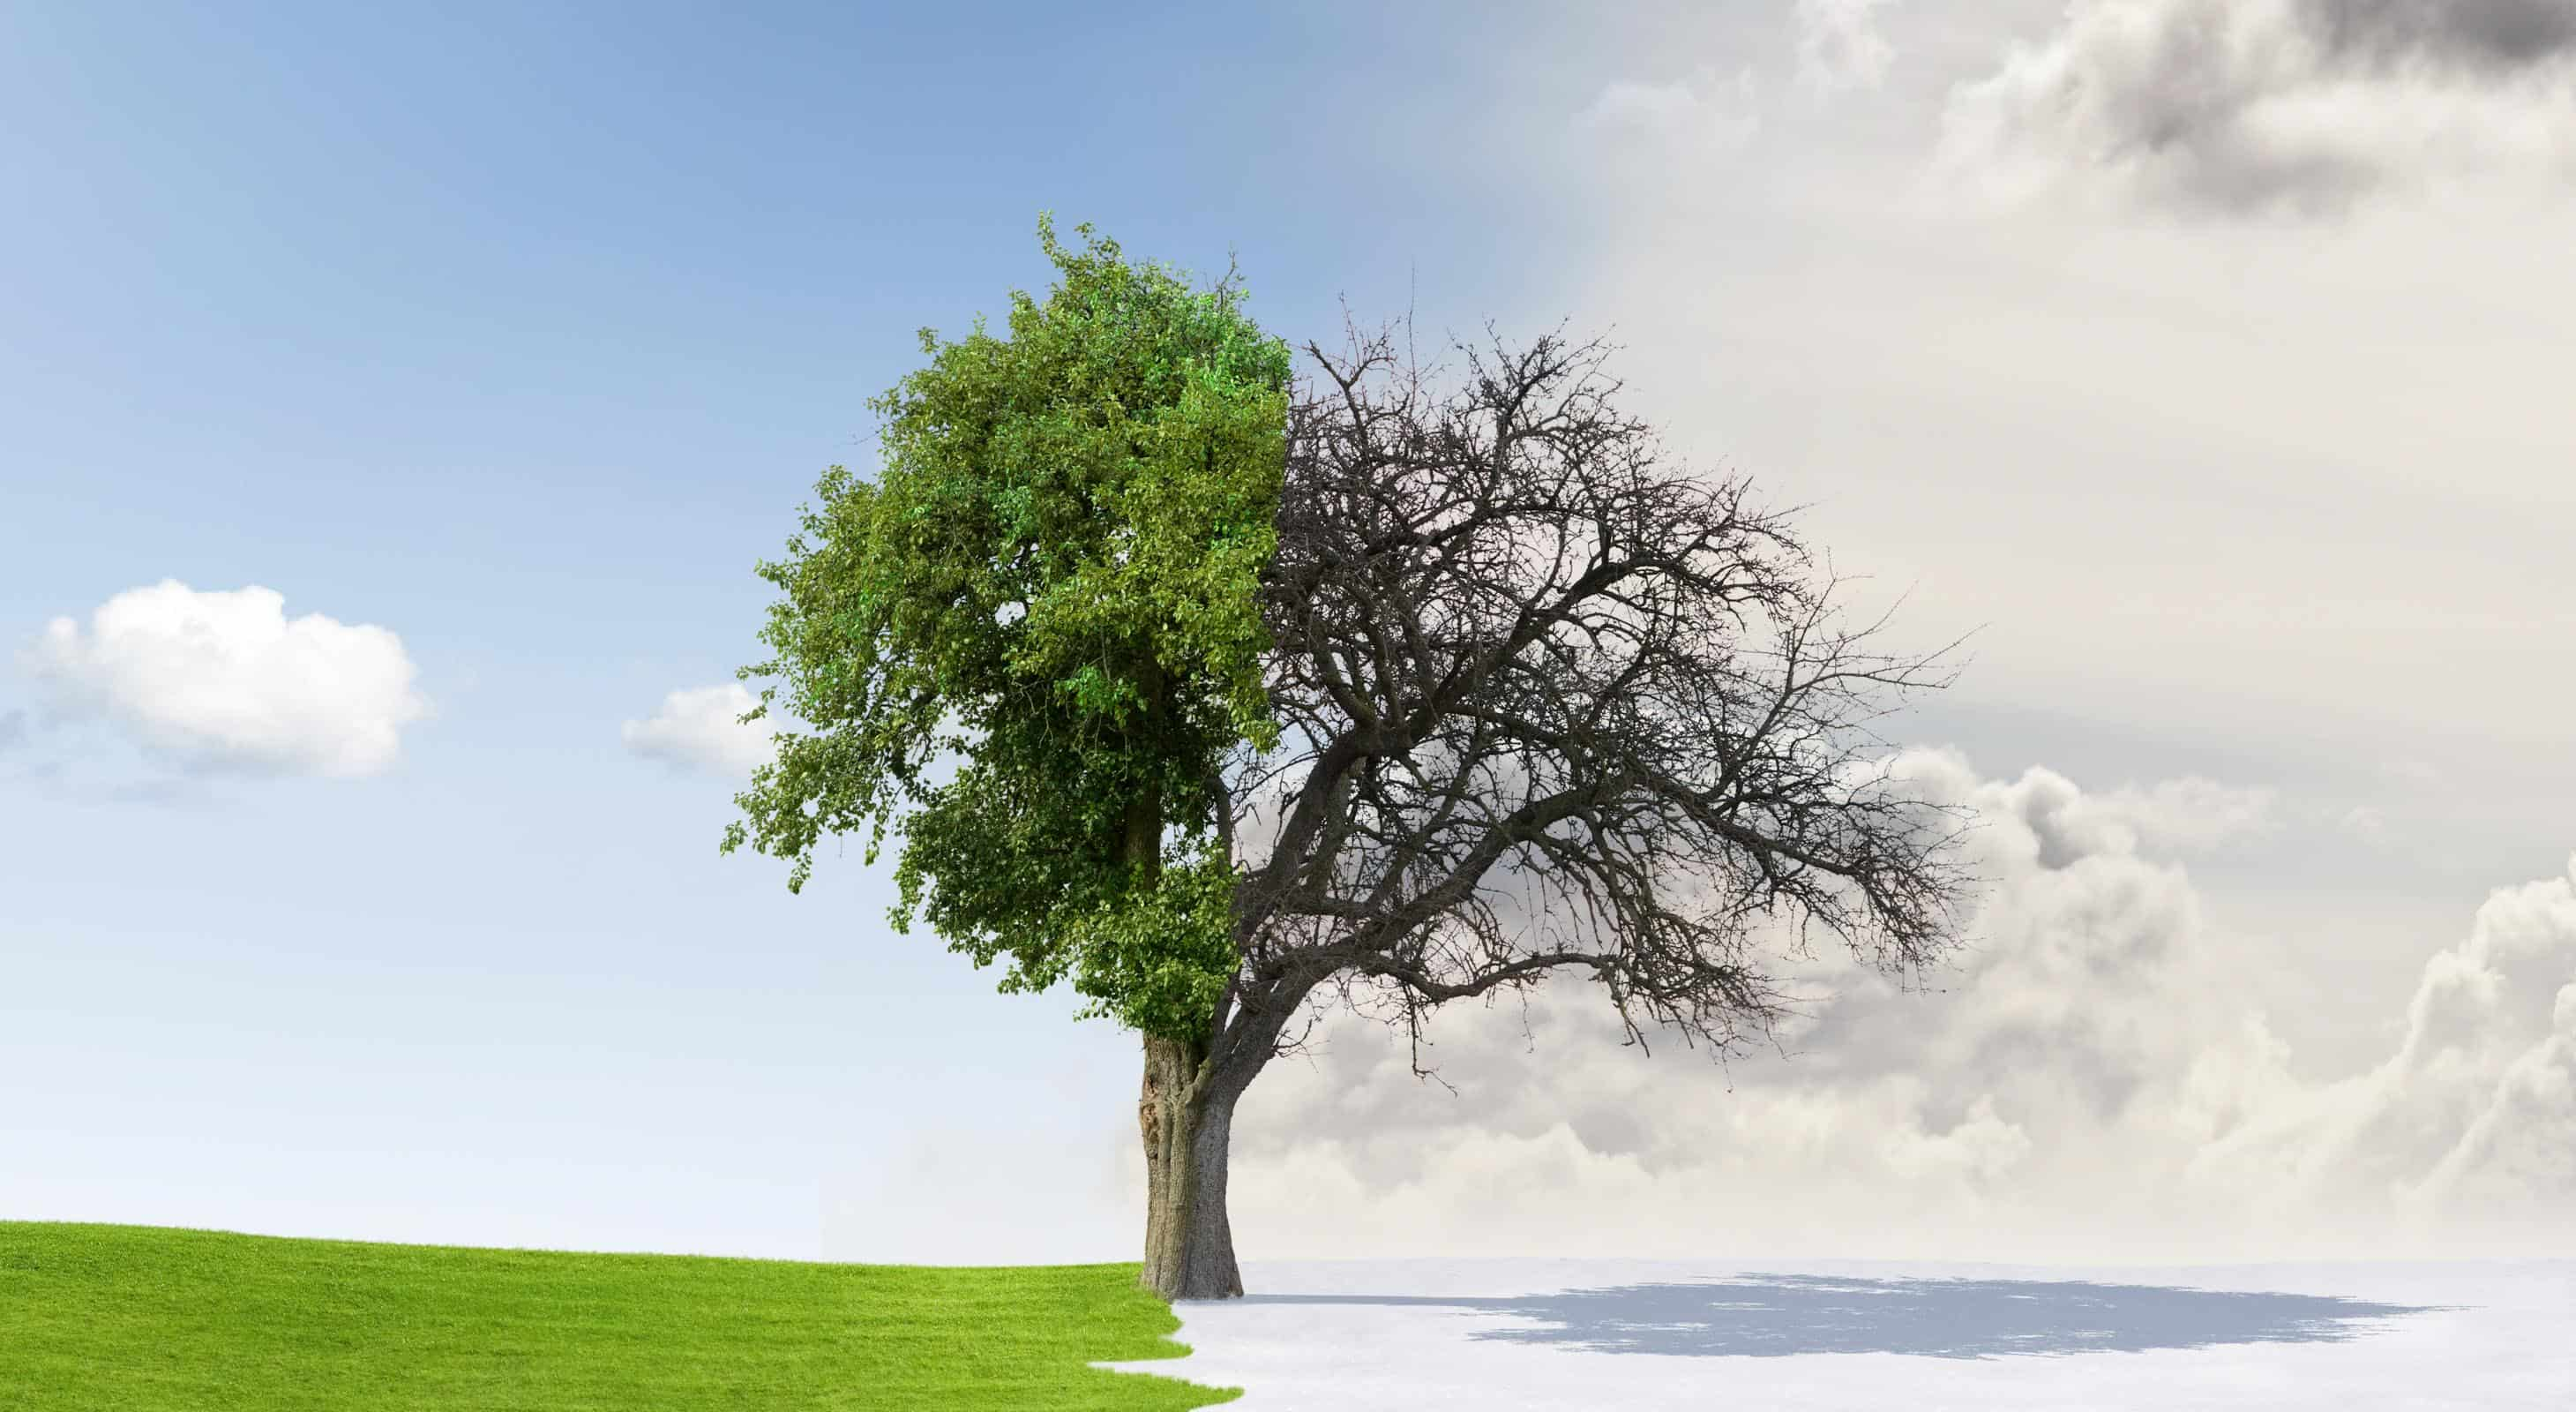 Tree 1/2 alive 1/2 dead - symbolizes PAII